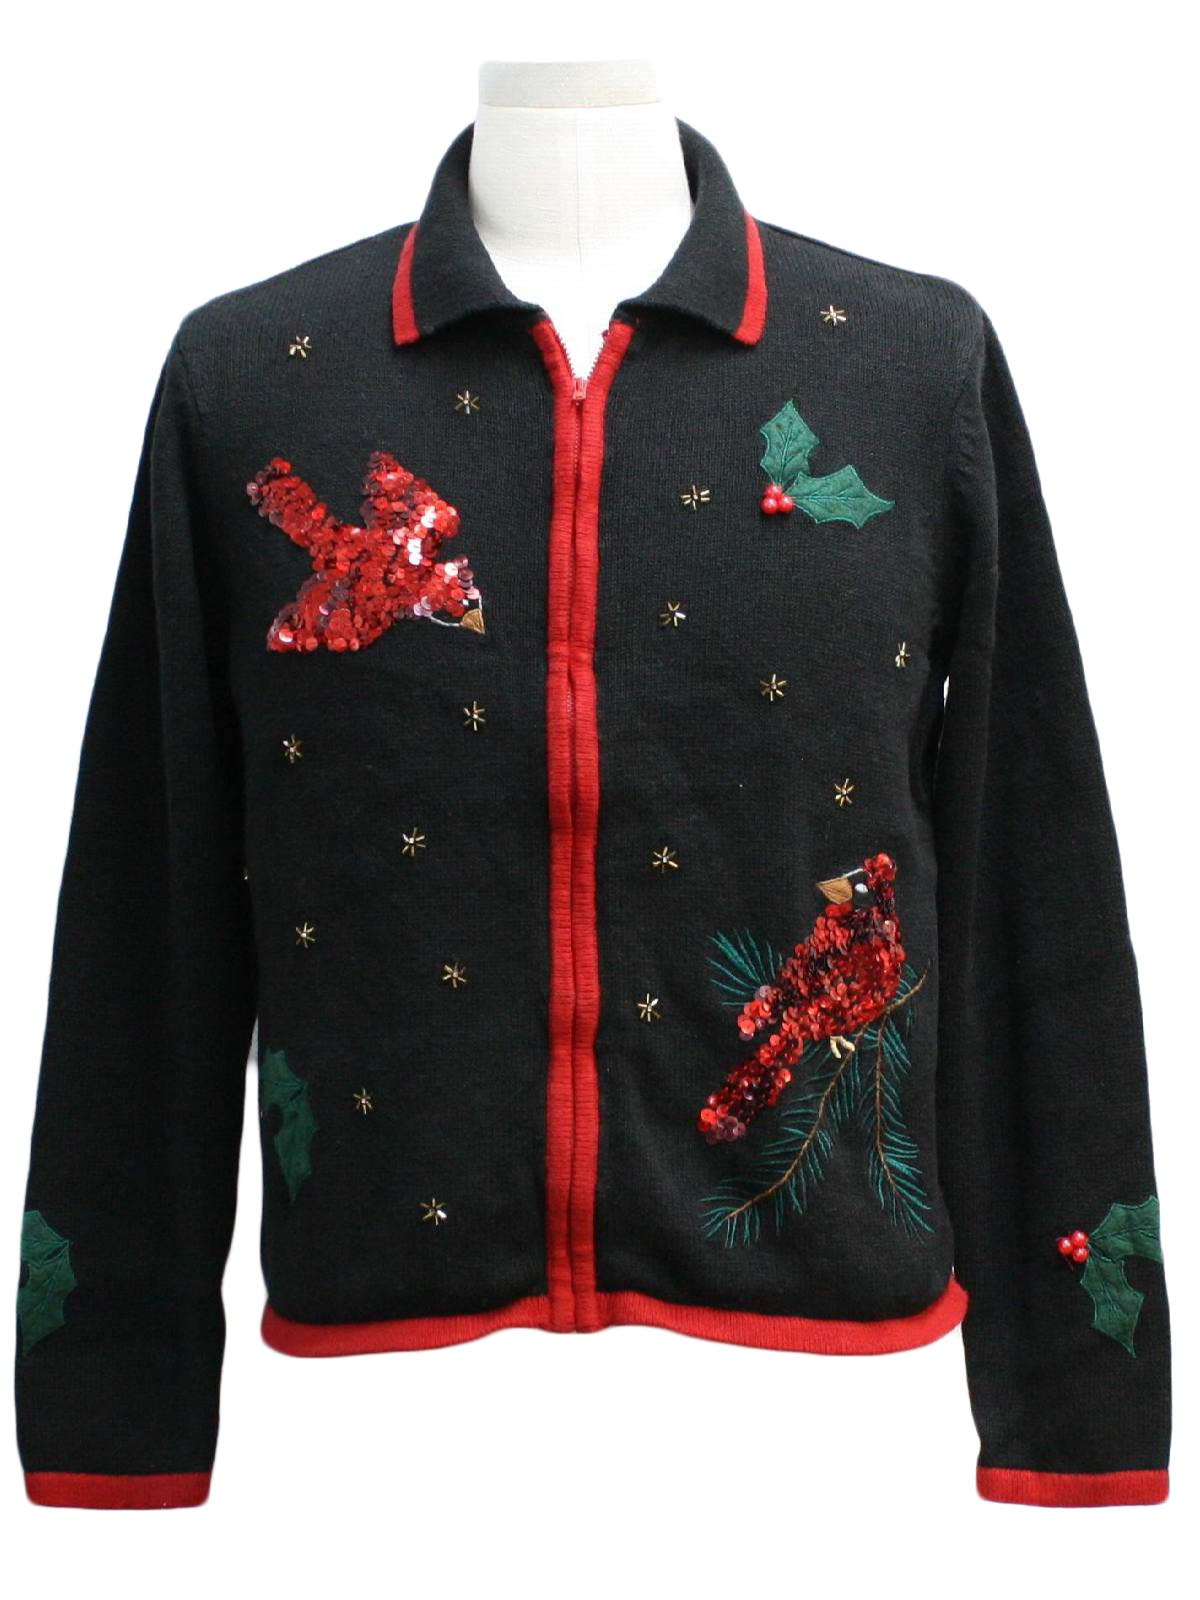 Ugly christmas sweater jason maxwell unisex black for Over the top ugly christmas sweaters